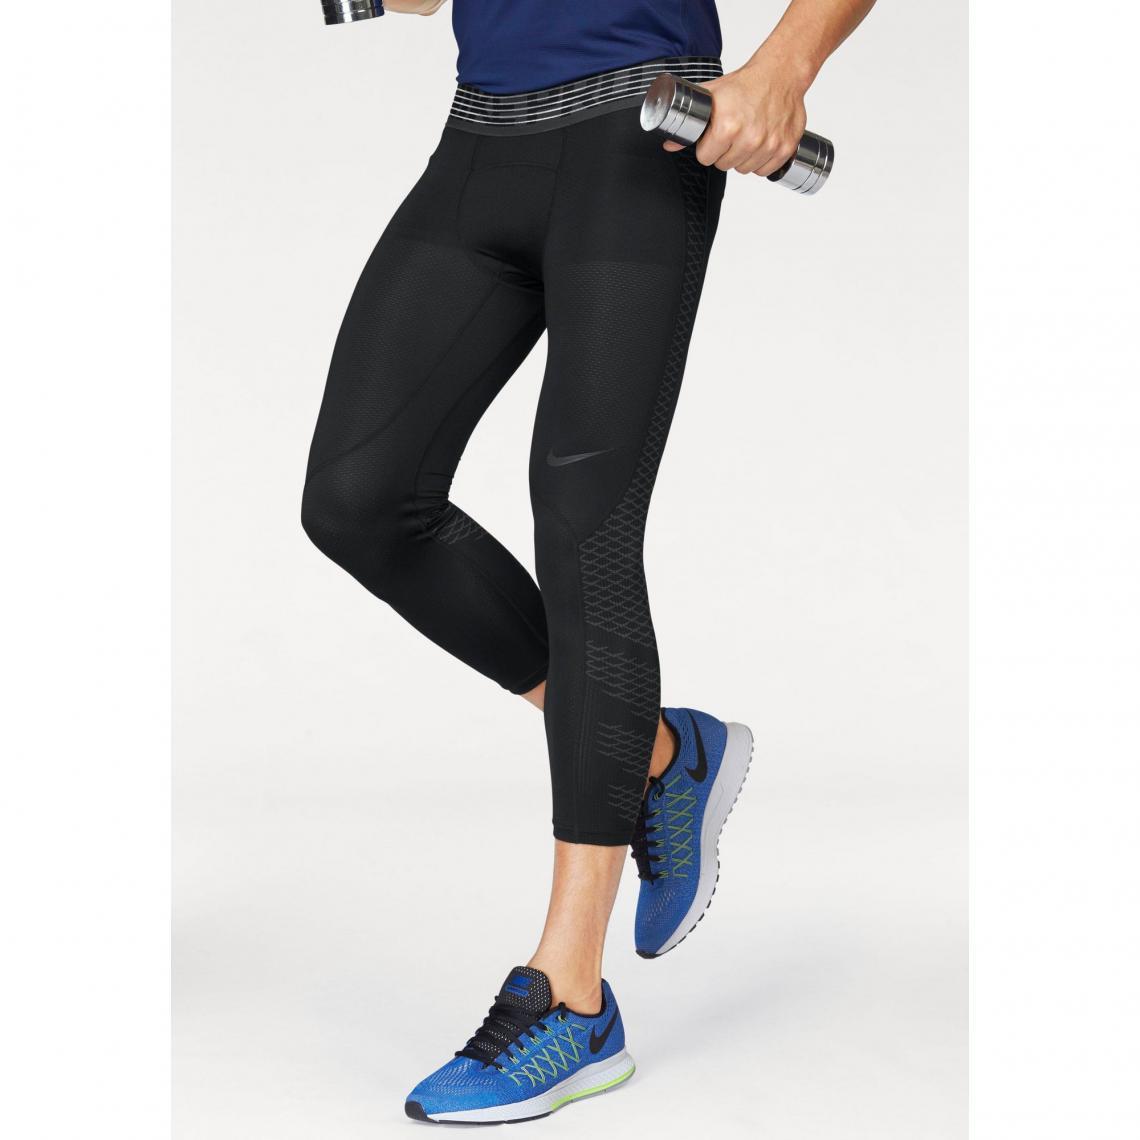 Collant de sport 34 homme Pro Hypercool Tight 3QT Nike - Noir Nike Homme 12549bd3aee